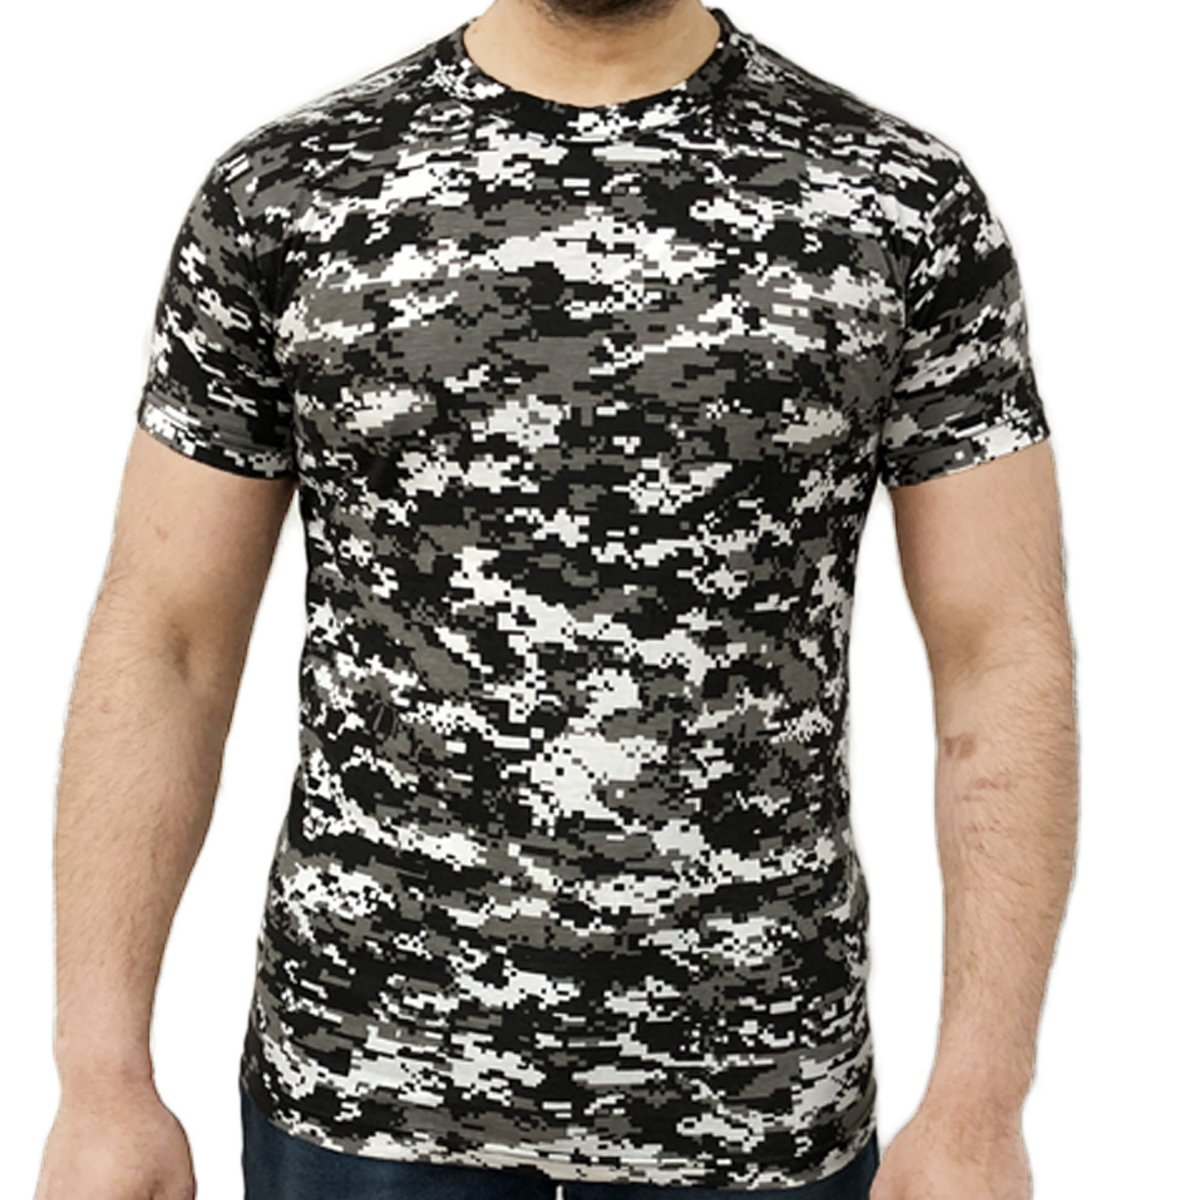 Game Digital Camouflage T-Shirts - Digital Urban S